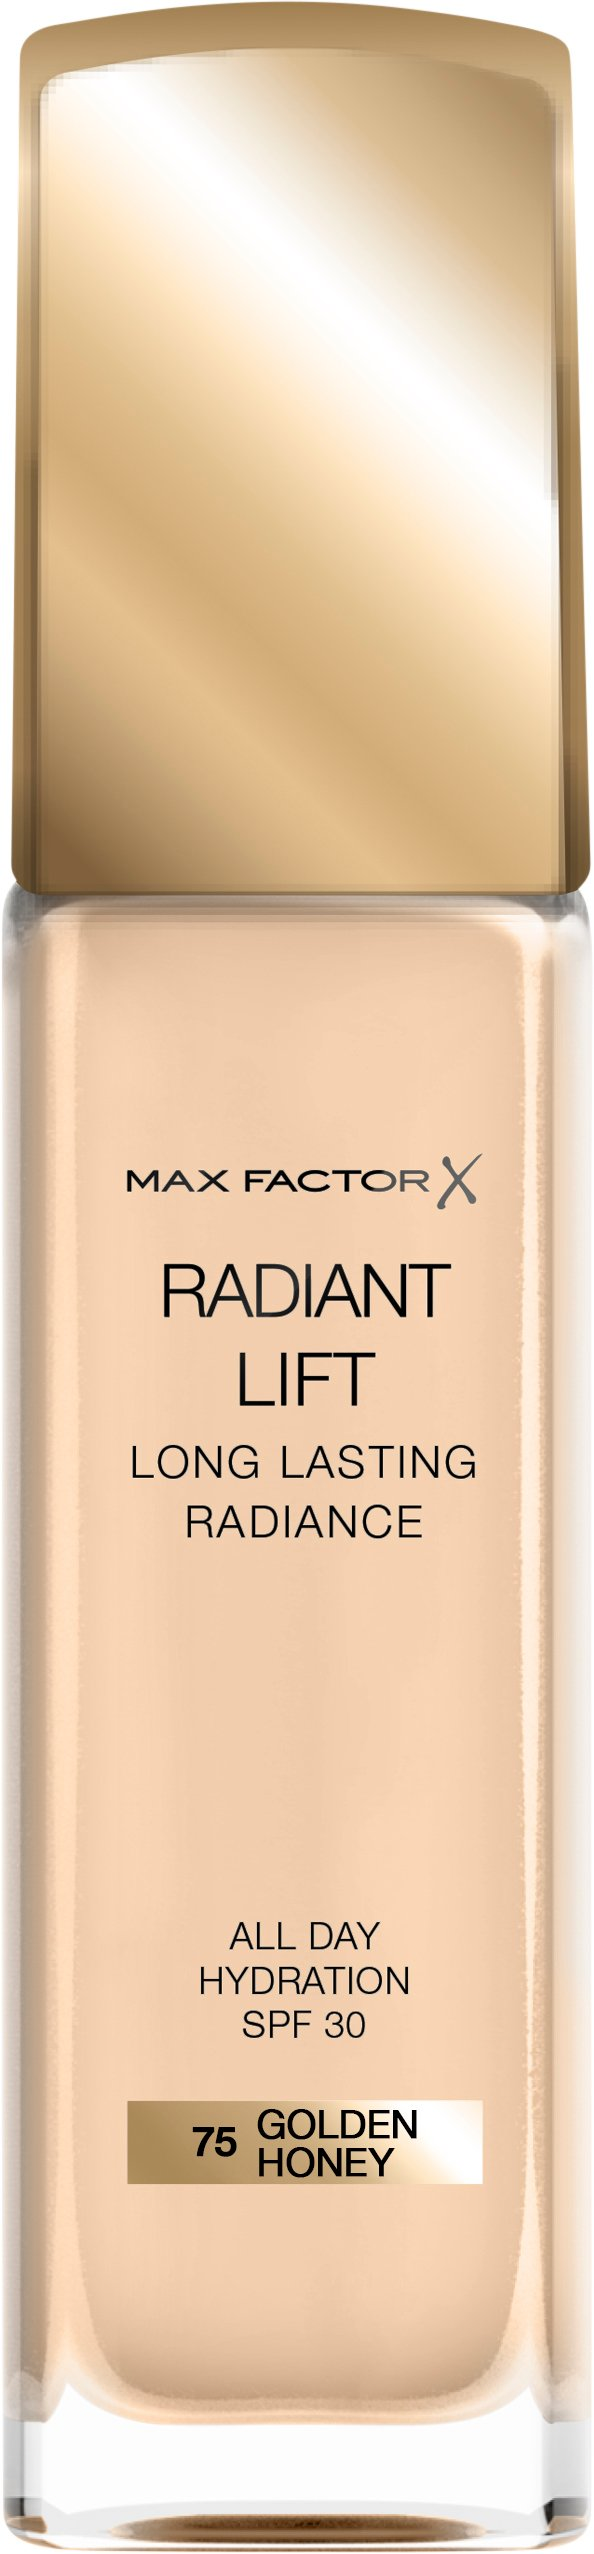 Max Factor - Radiant Lift Foundation - 075 Golden Hour